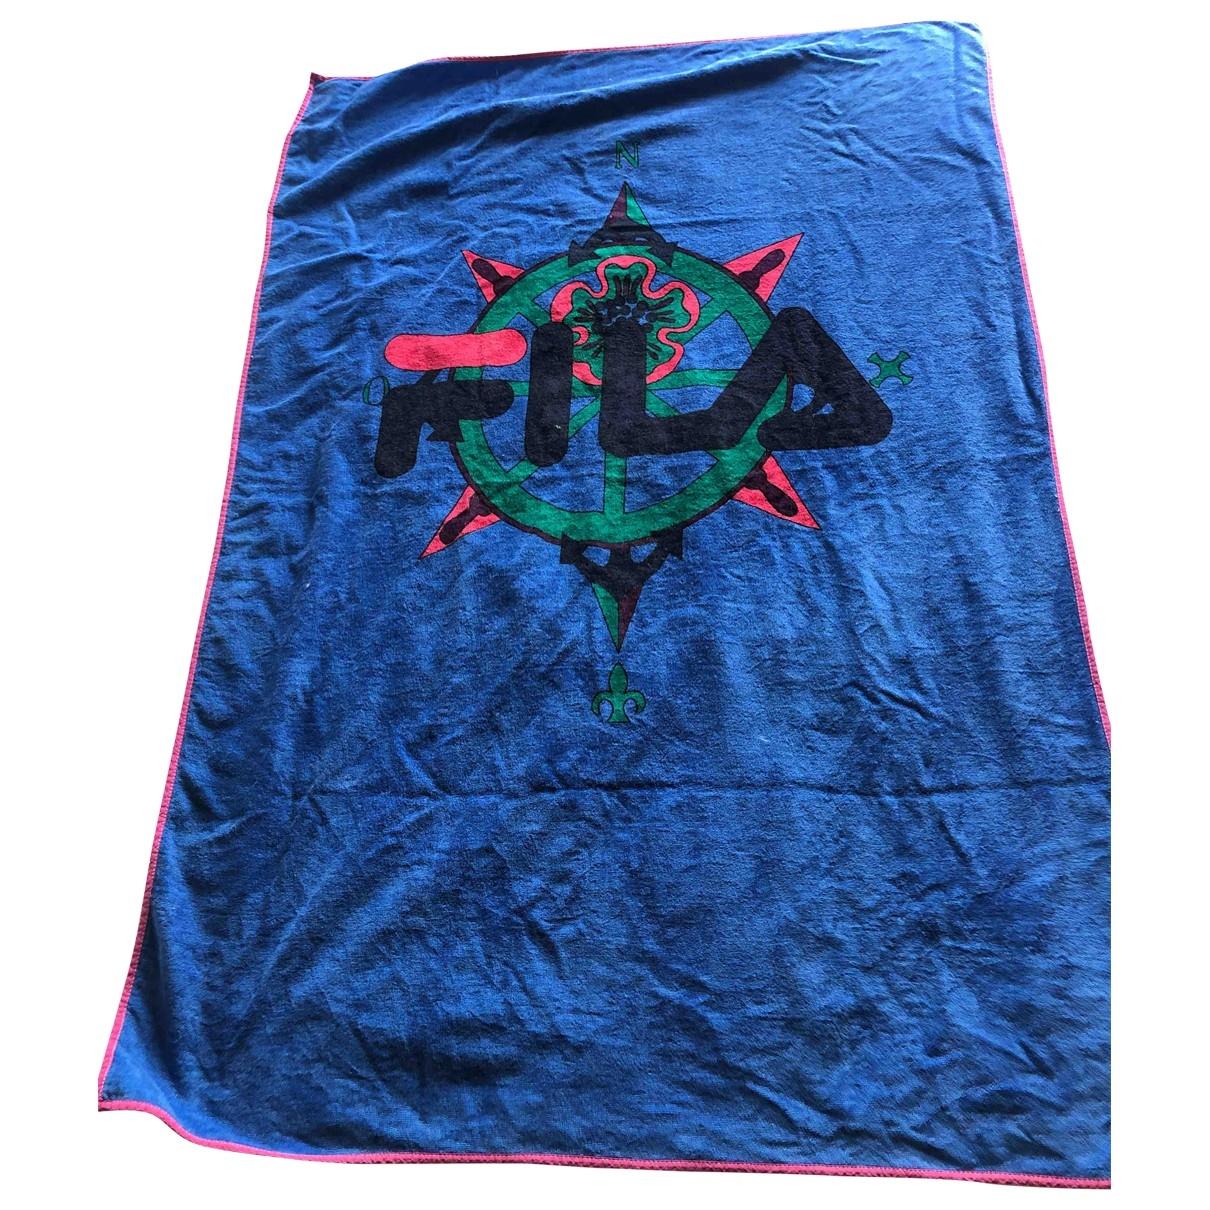 Textil de hogar Fila